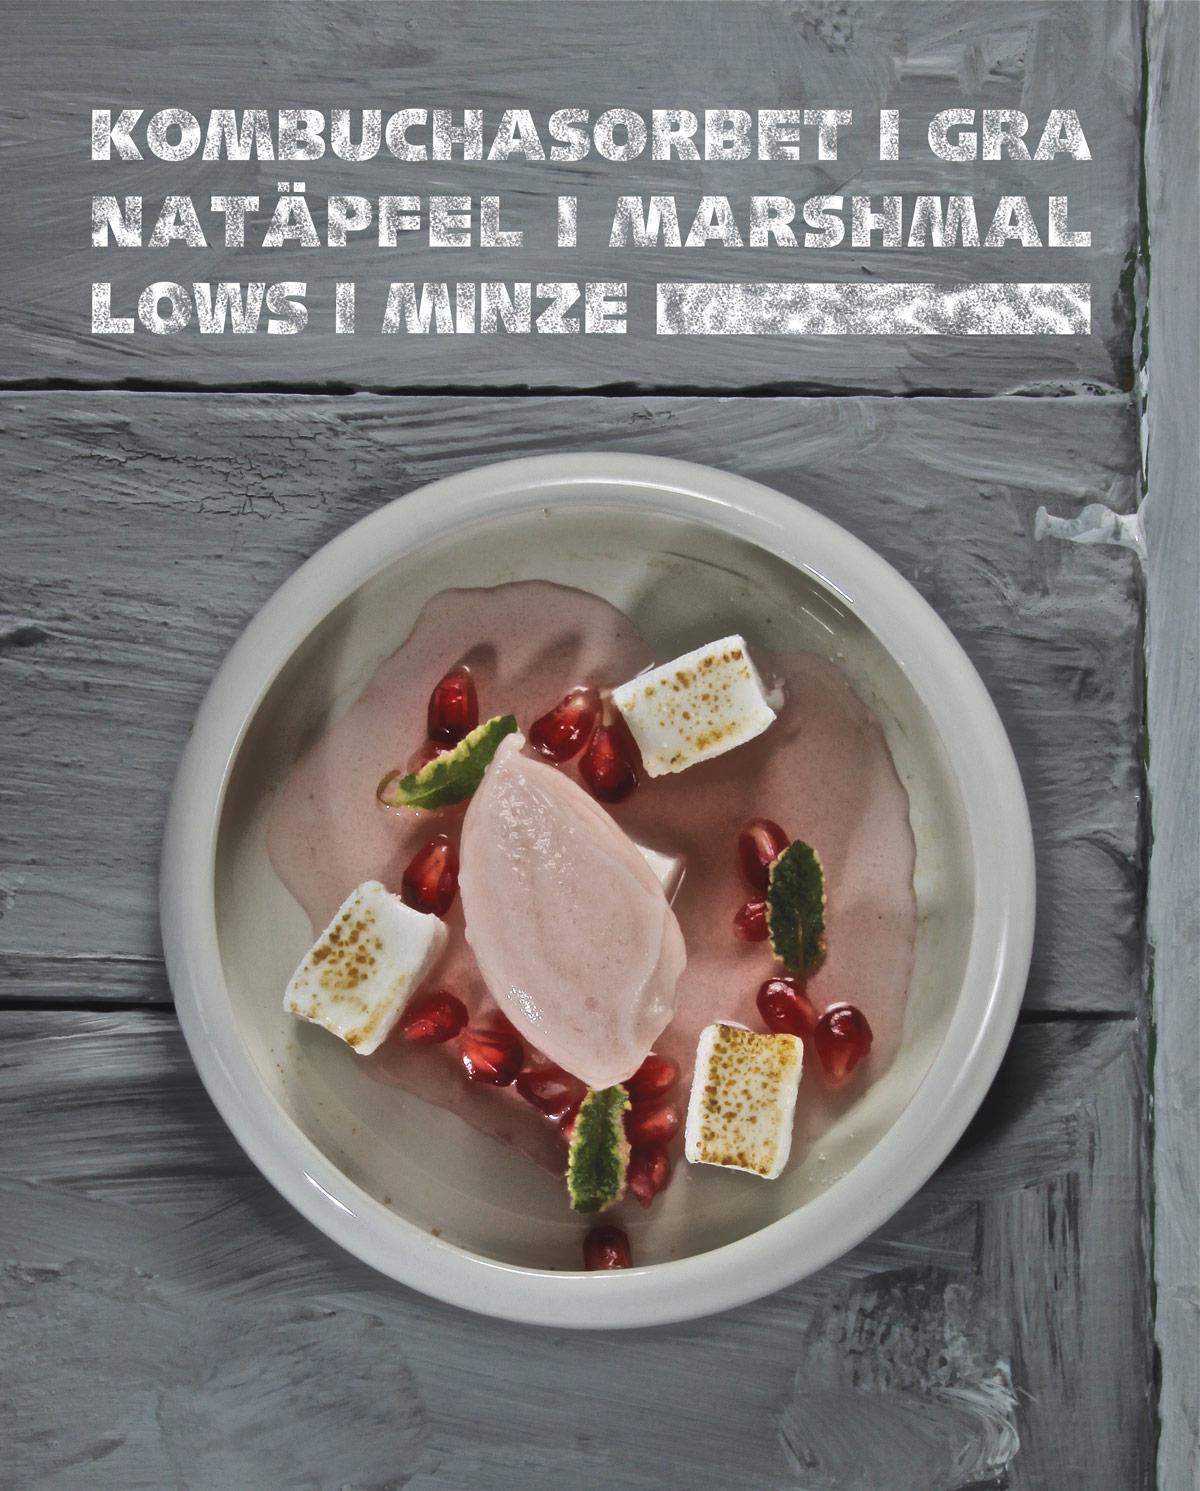 Kombuchasorbet,-Granatäpfel,-Marshmellow,-Minze